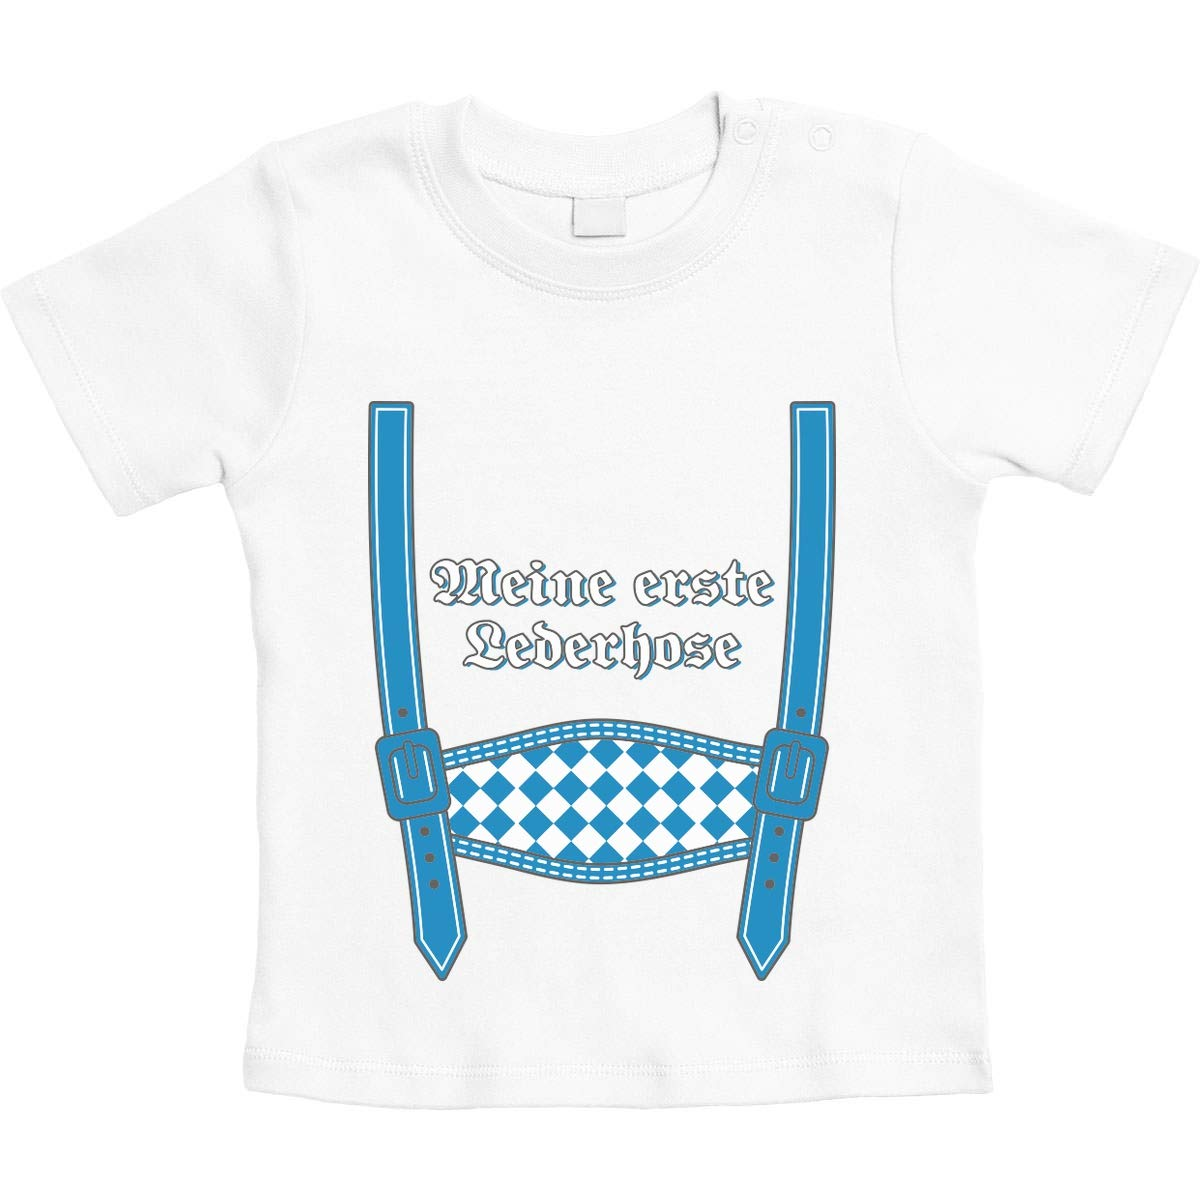 Oktoberfest Babys Unisex Baby T-Shirt Gr Meine erste Lederhose 66-93